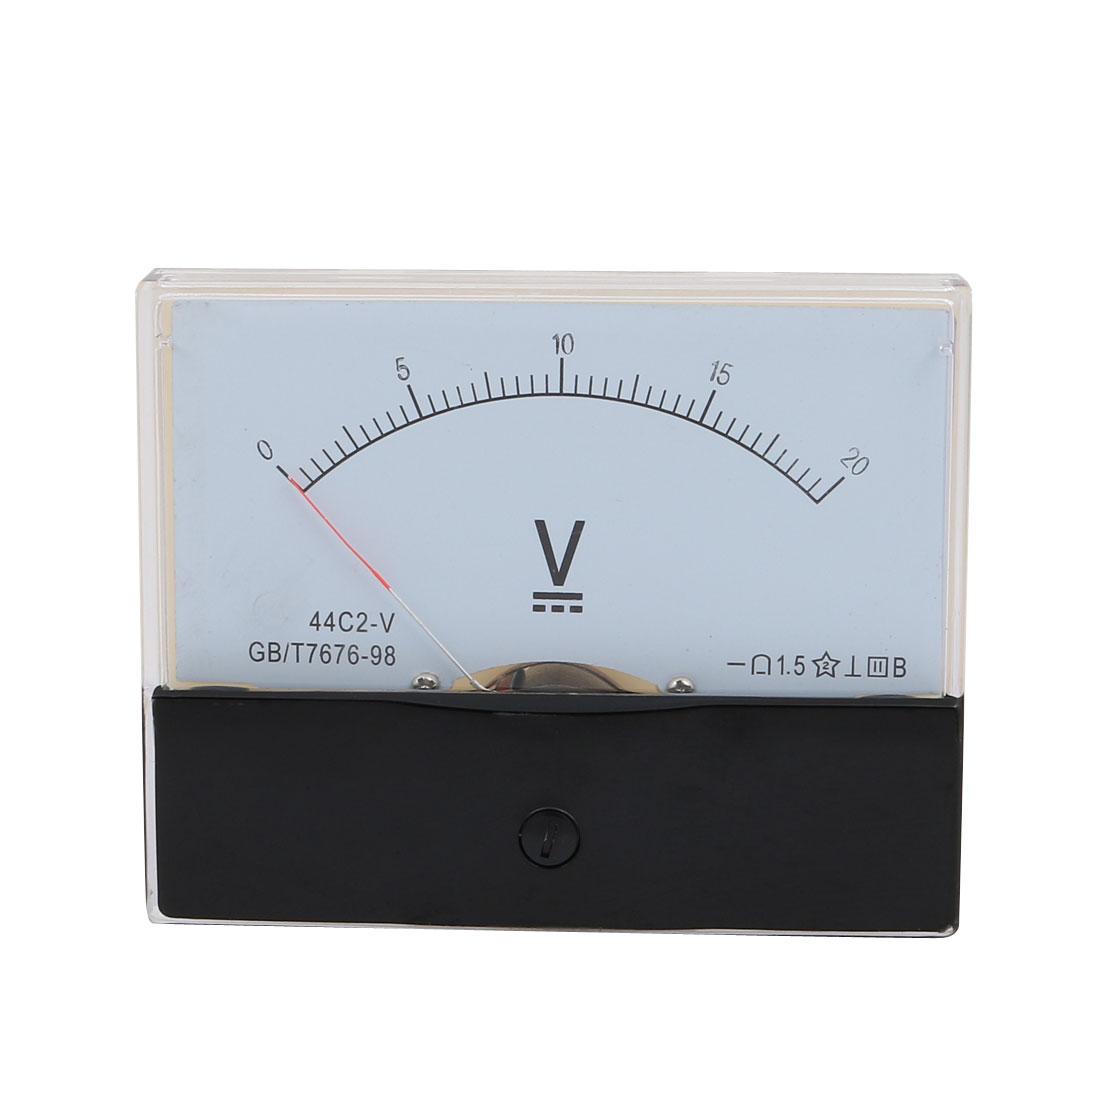 Measurement Tool Analog Panel Voltmeter DC 0 - 20V Measuring Range